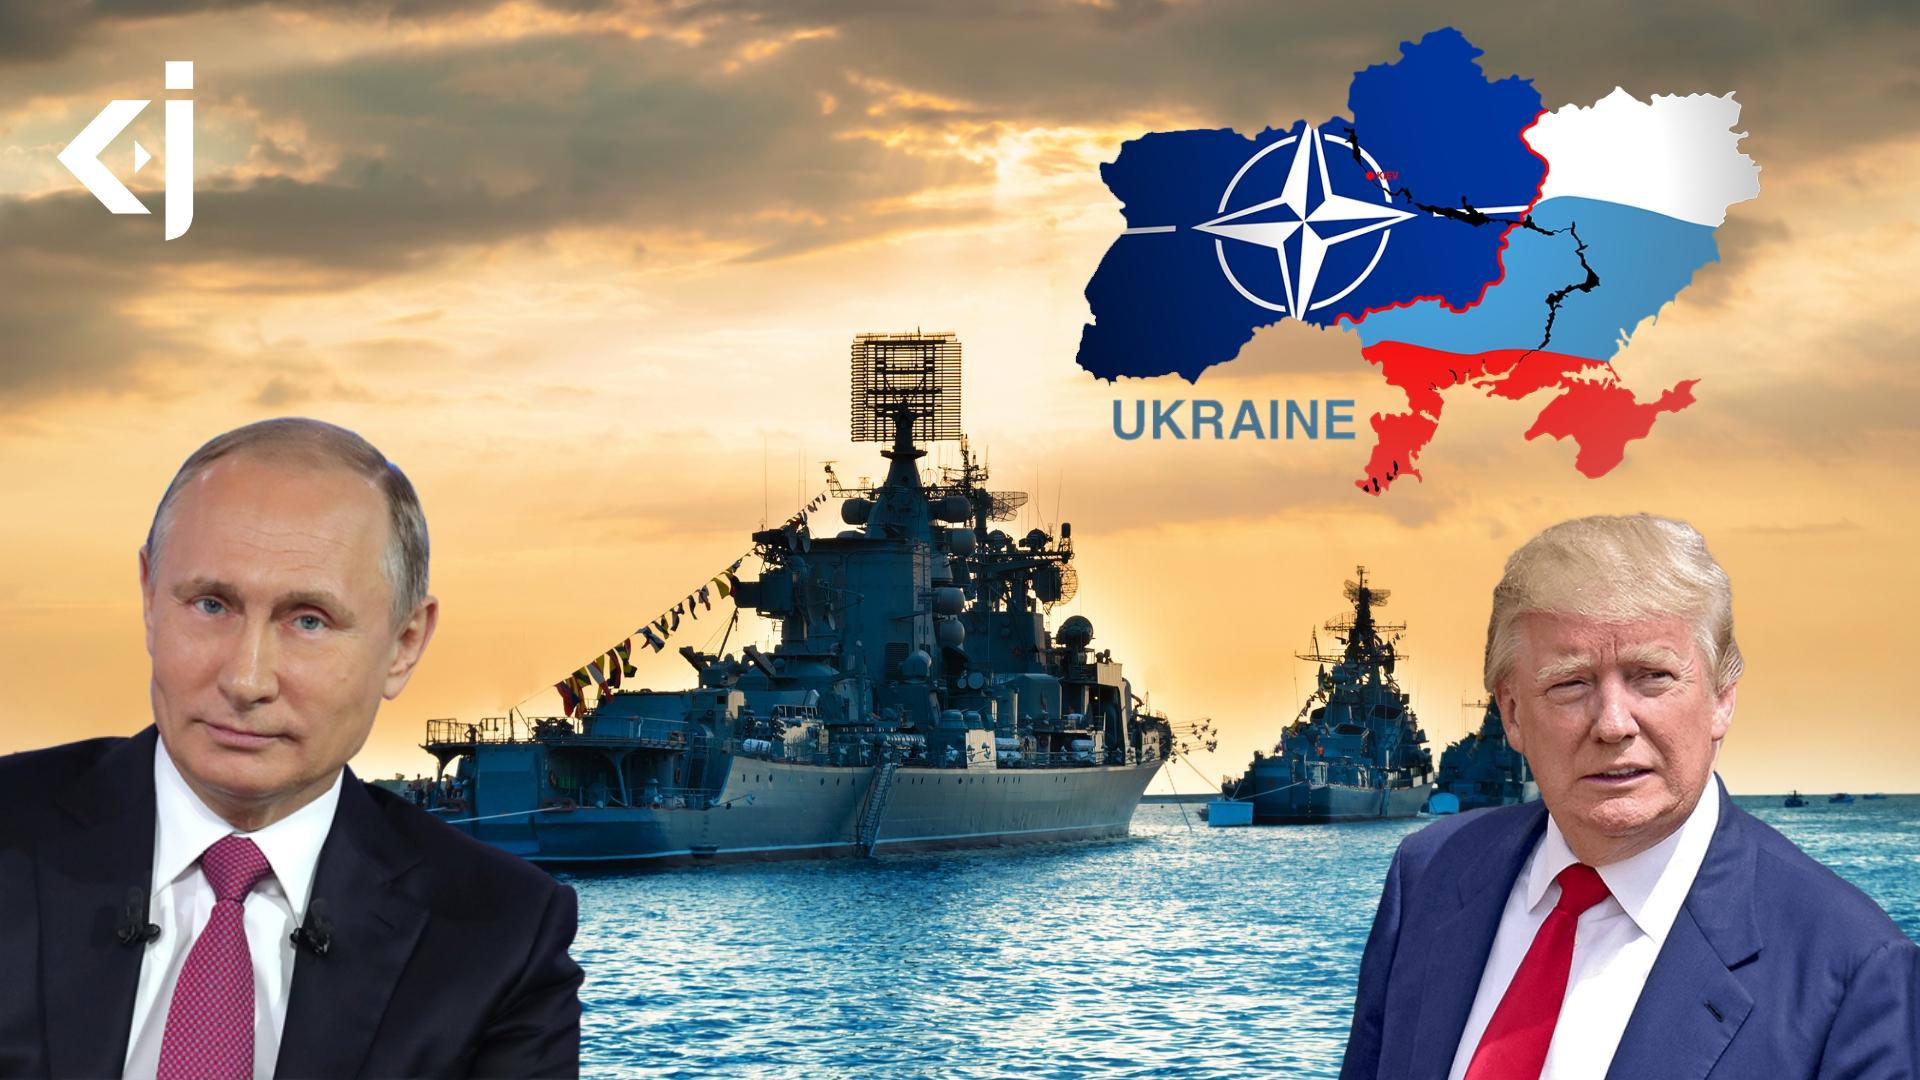 Will Ukraine begin the breakup of the Russian Federation?